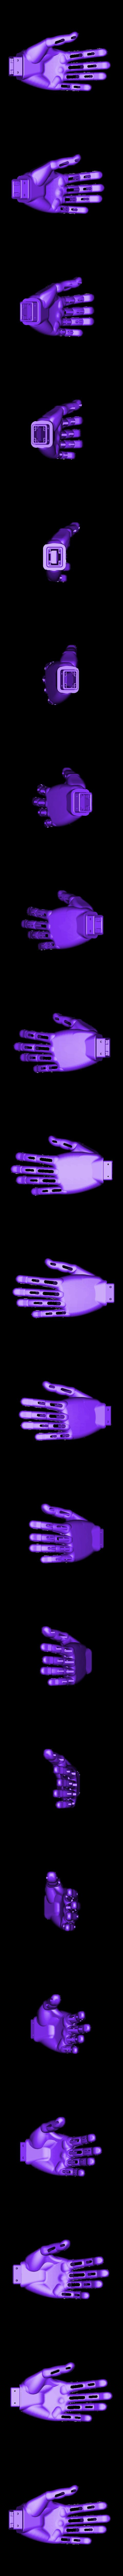 hand_left.STL Download free STL file Poppy Torso • 3D printable model, PoppyProject